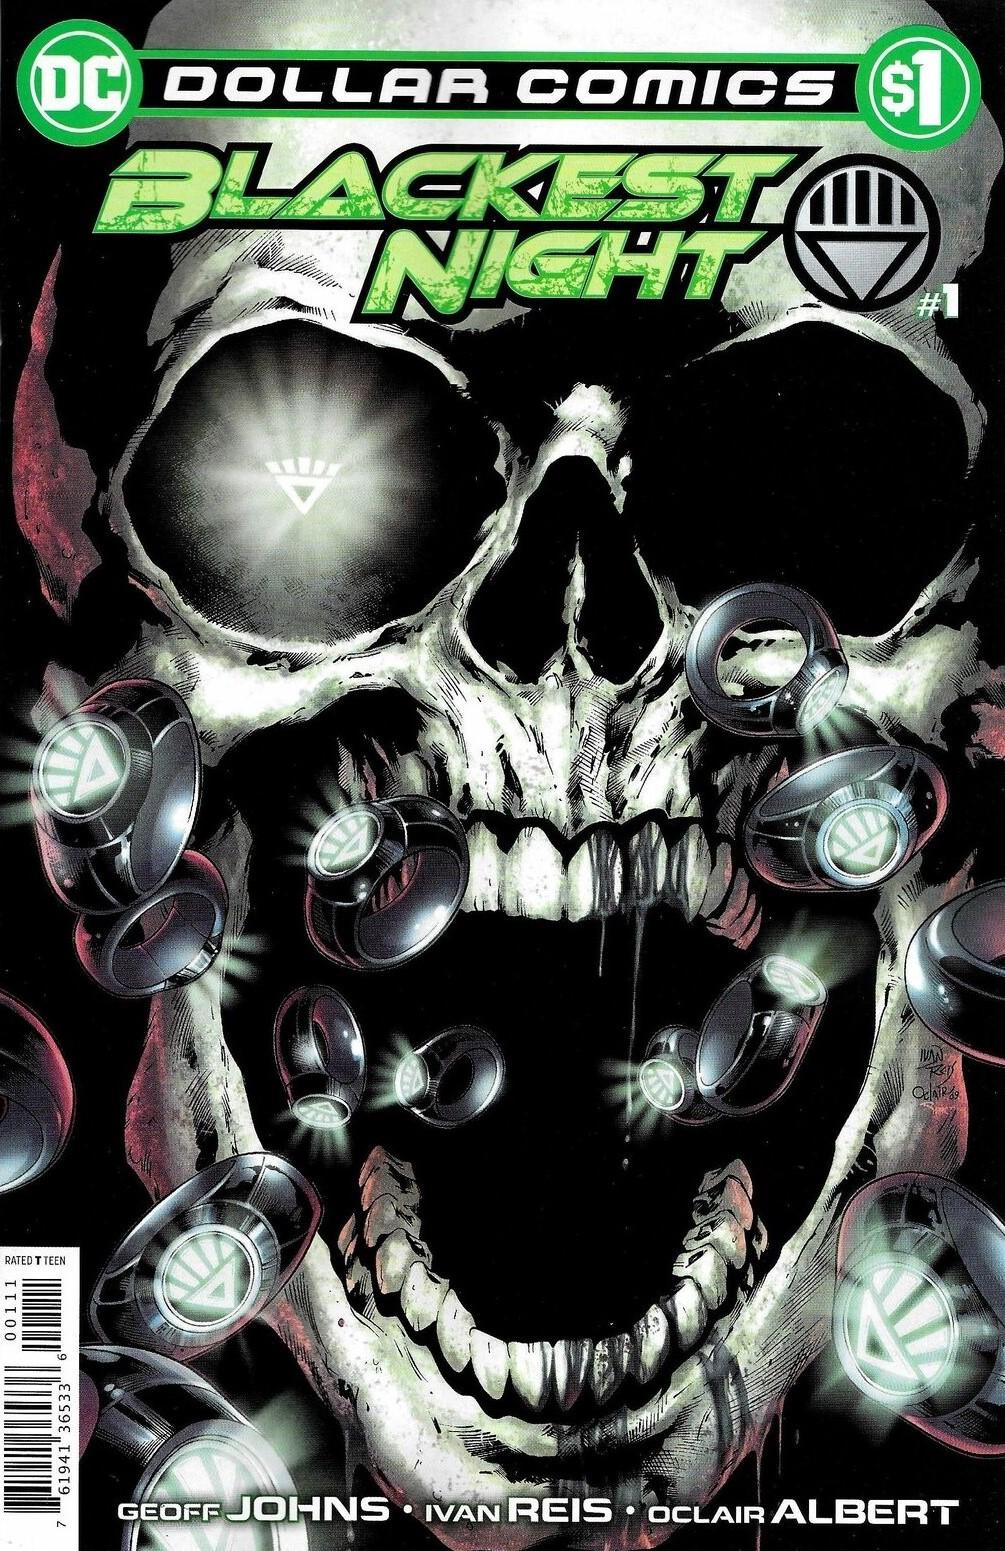 Dollar Comics: Blackest Night 1